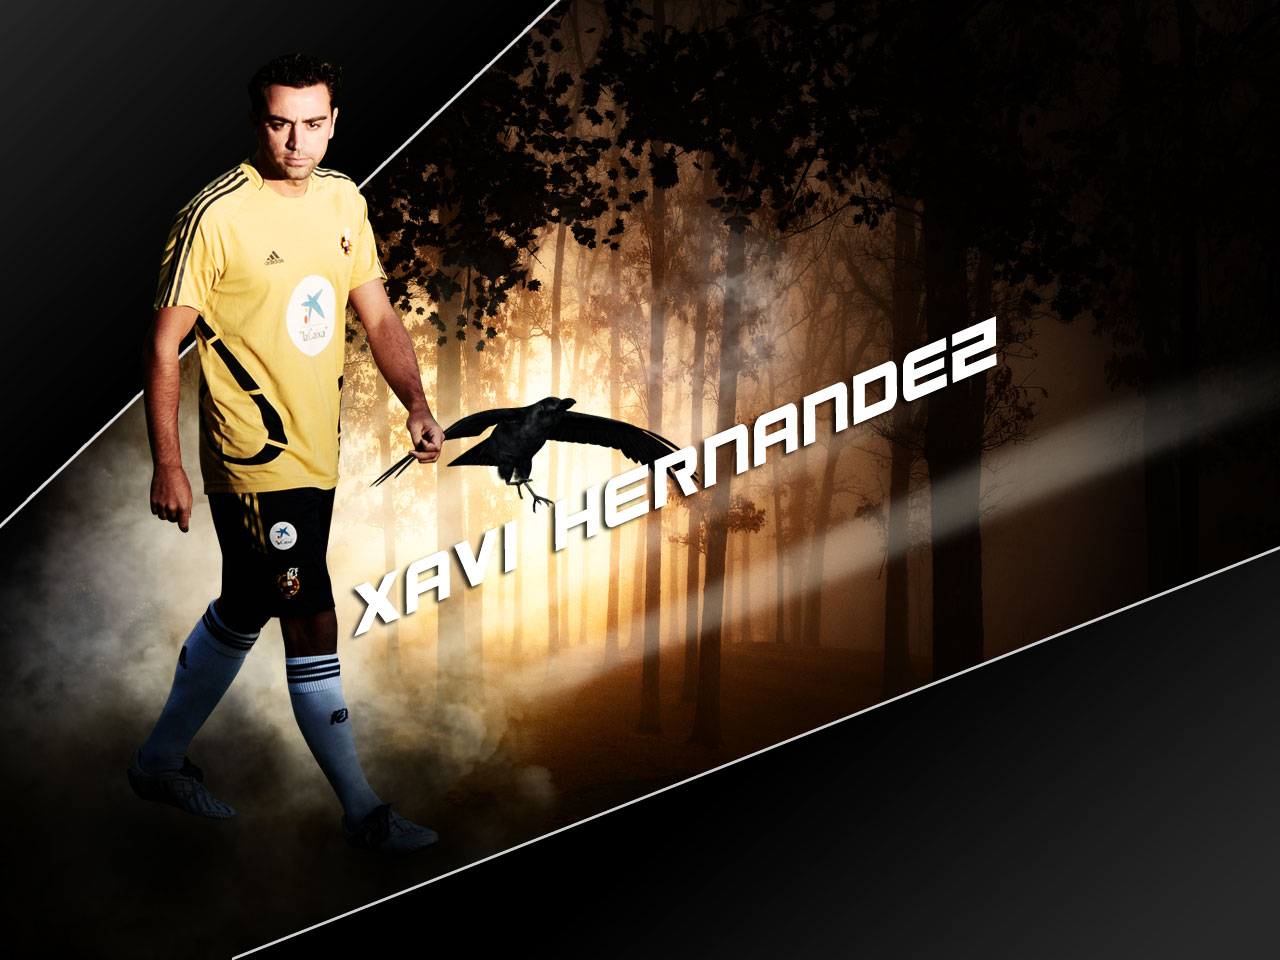 Xavi Hernandez HD Wallpapers 2012 images 1280x960